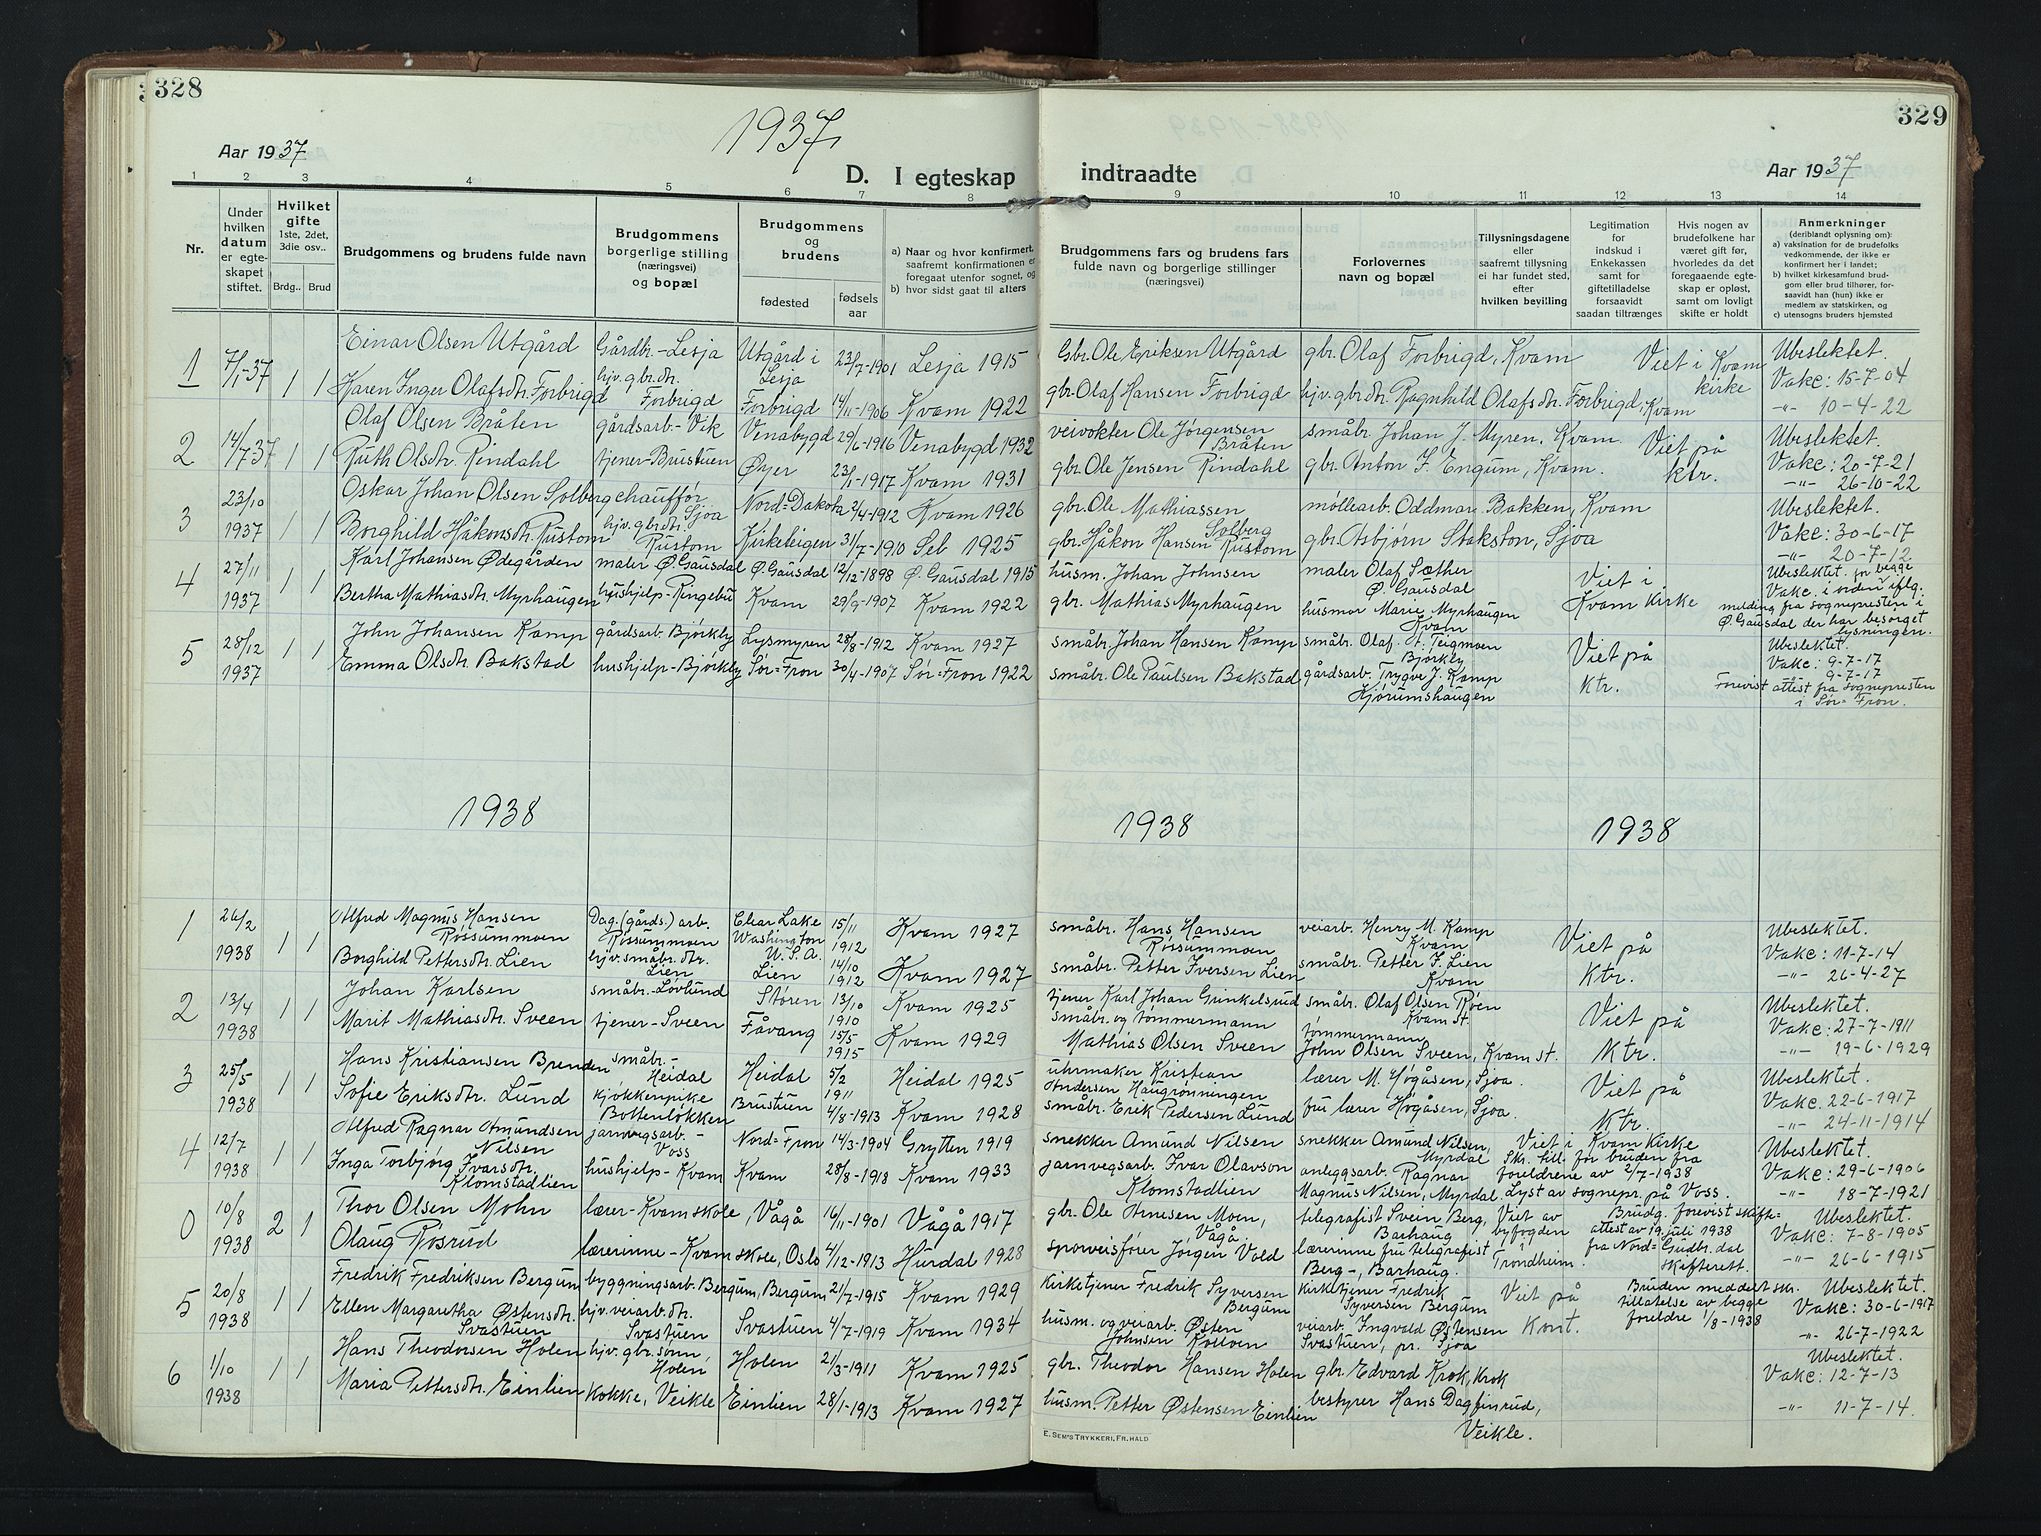 SAH, Nord-Fron prestekontor, Klokkerbok nr. 8, 1915-1948, s. 328-329